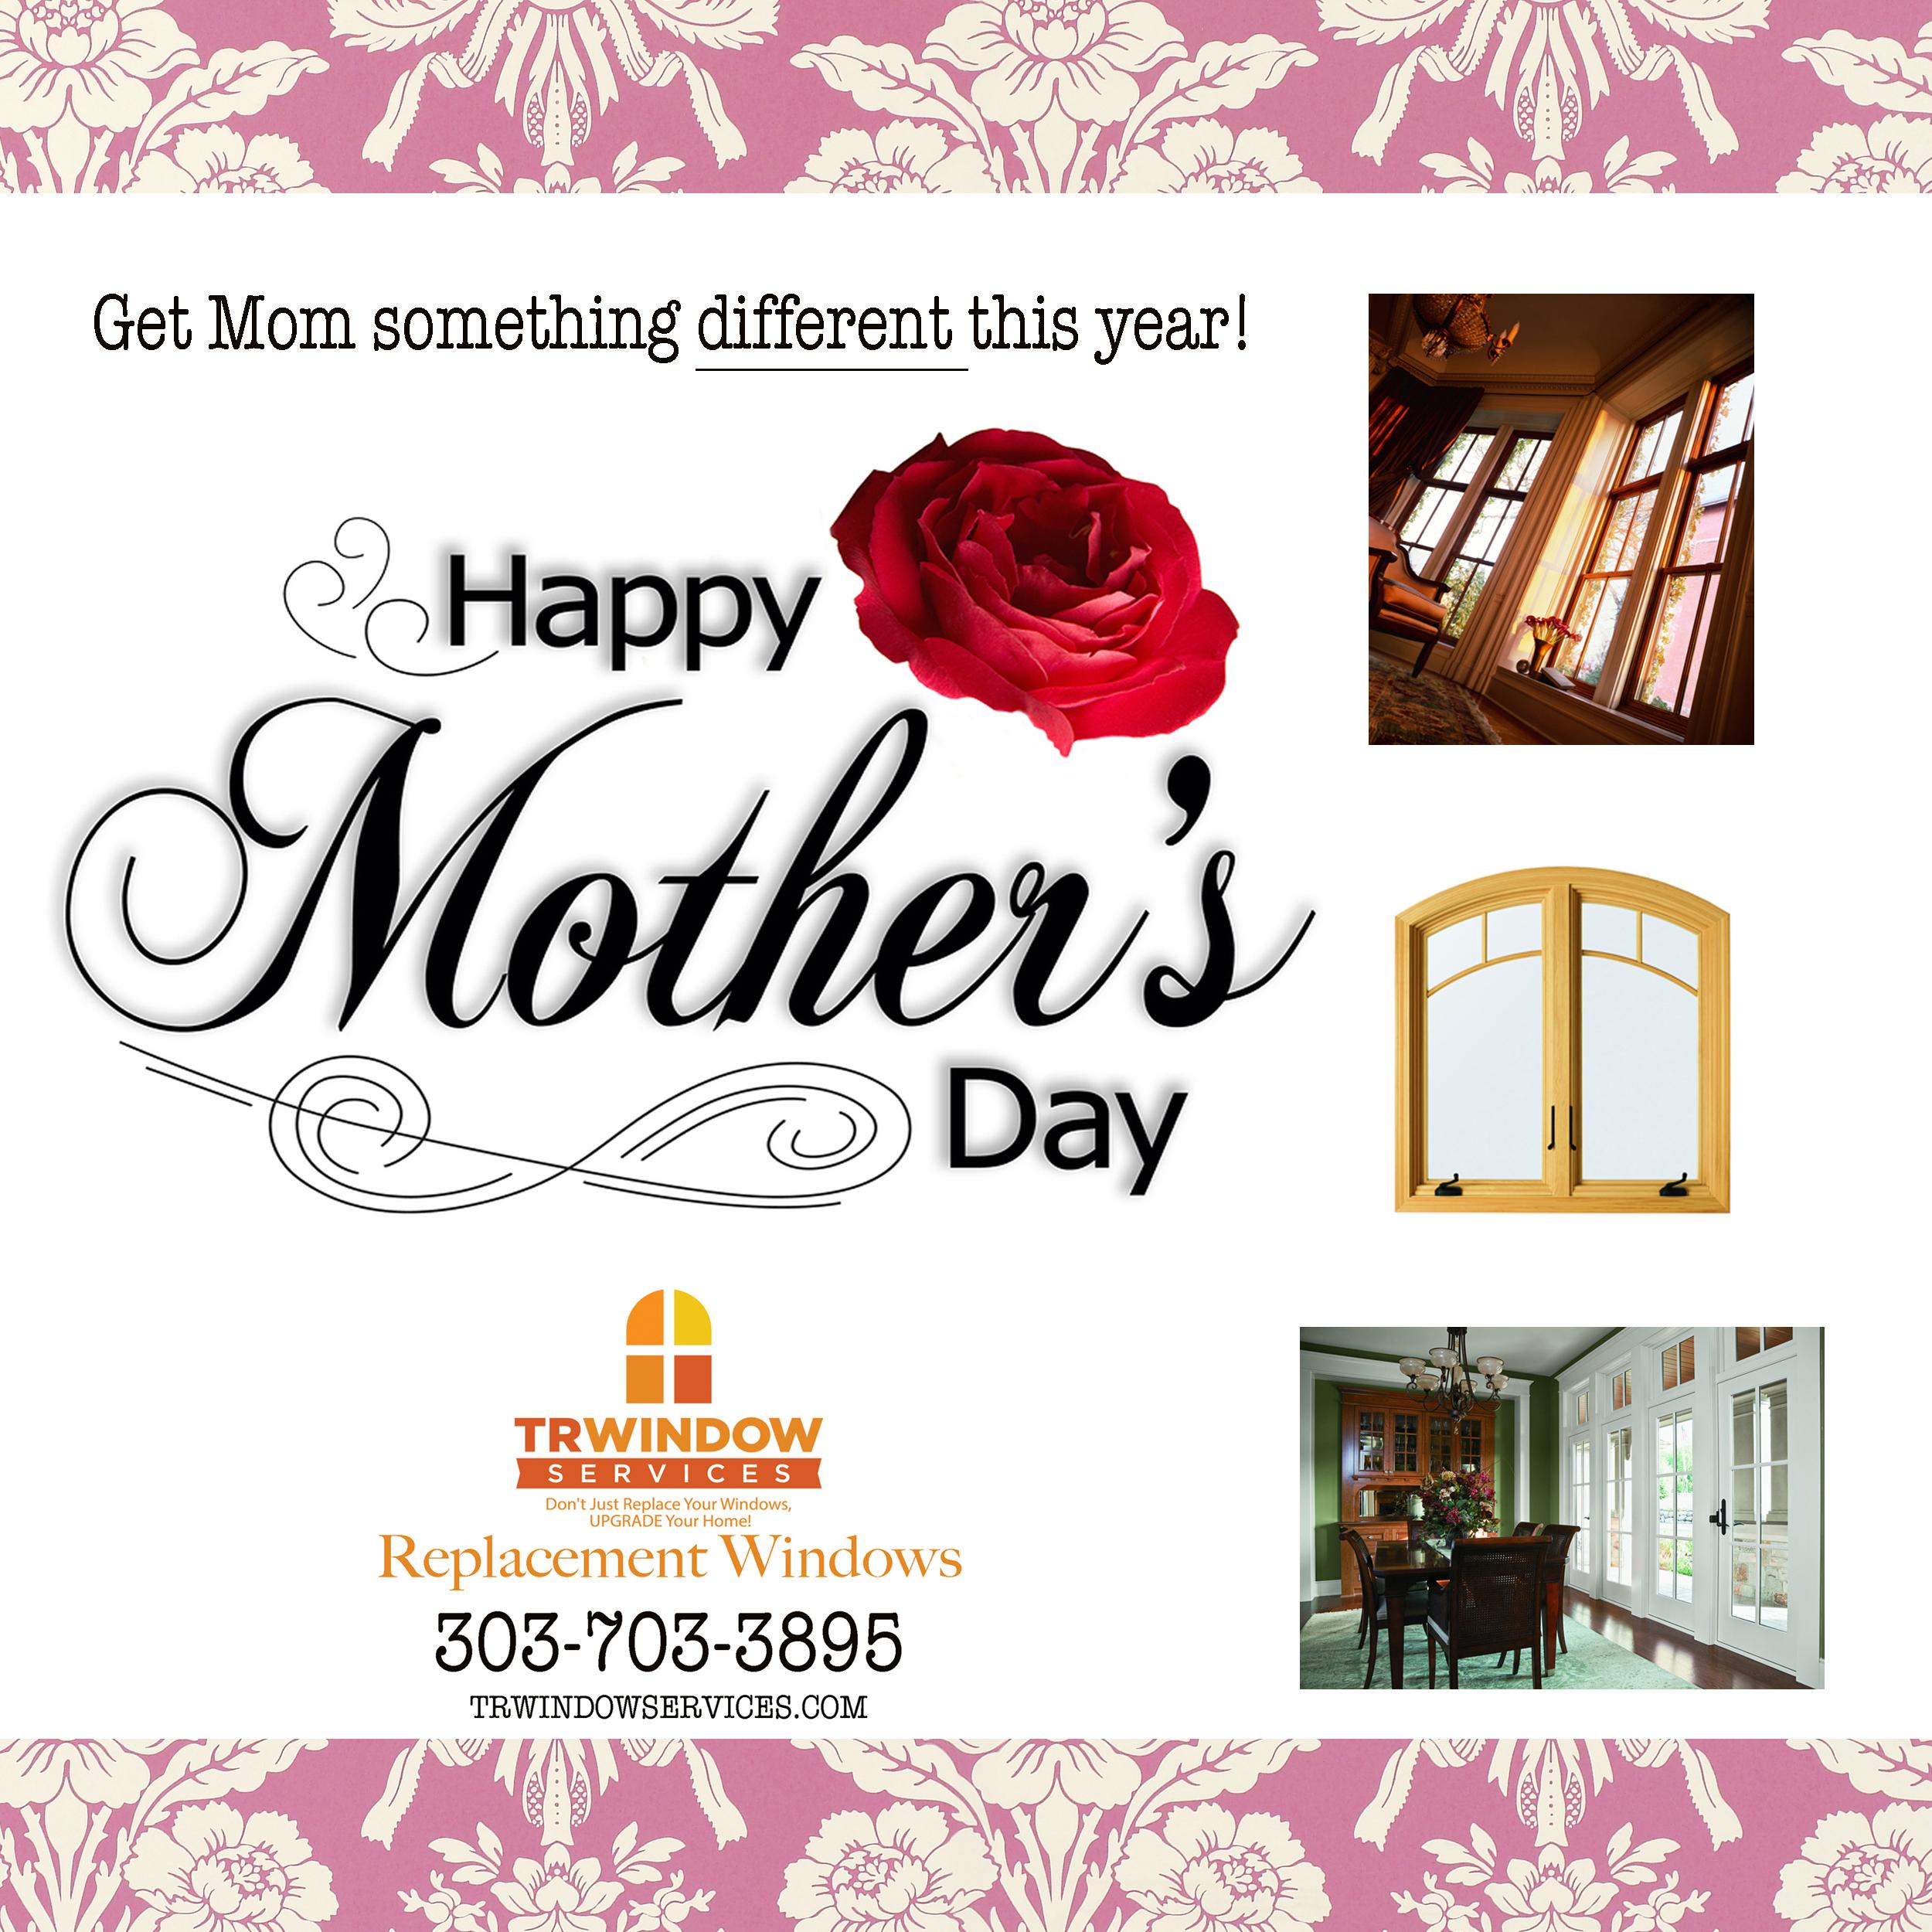 mother's day, mother's day gift, mother's day quote, denver replacement windows colorado